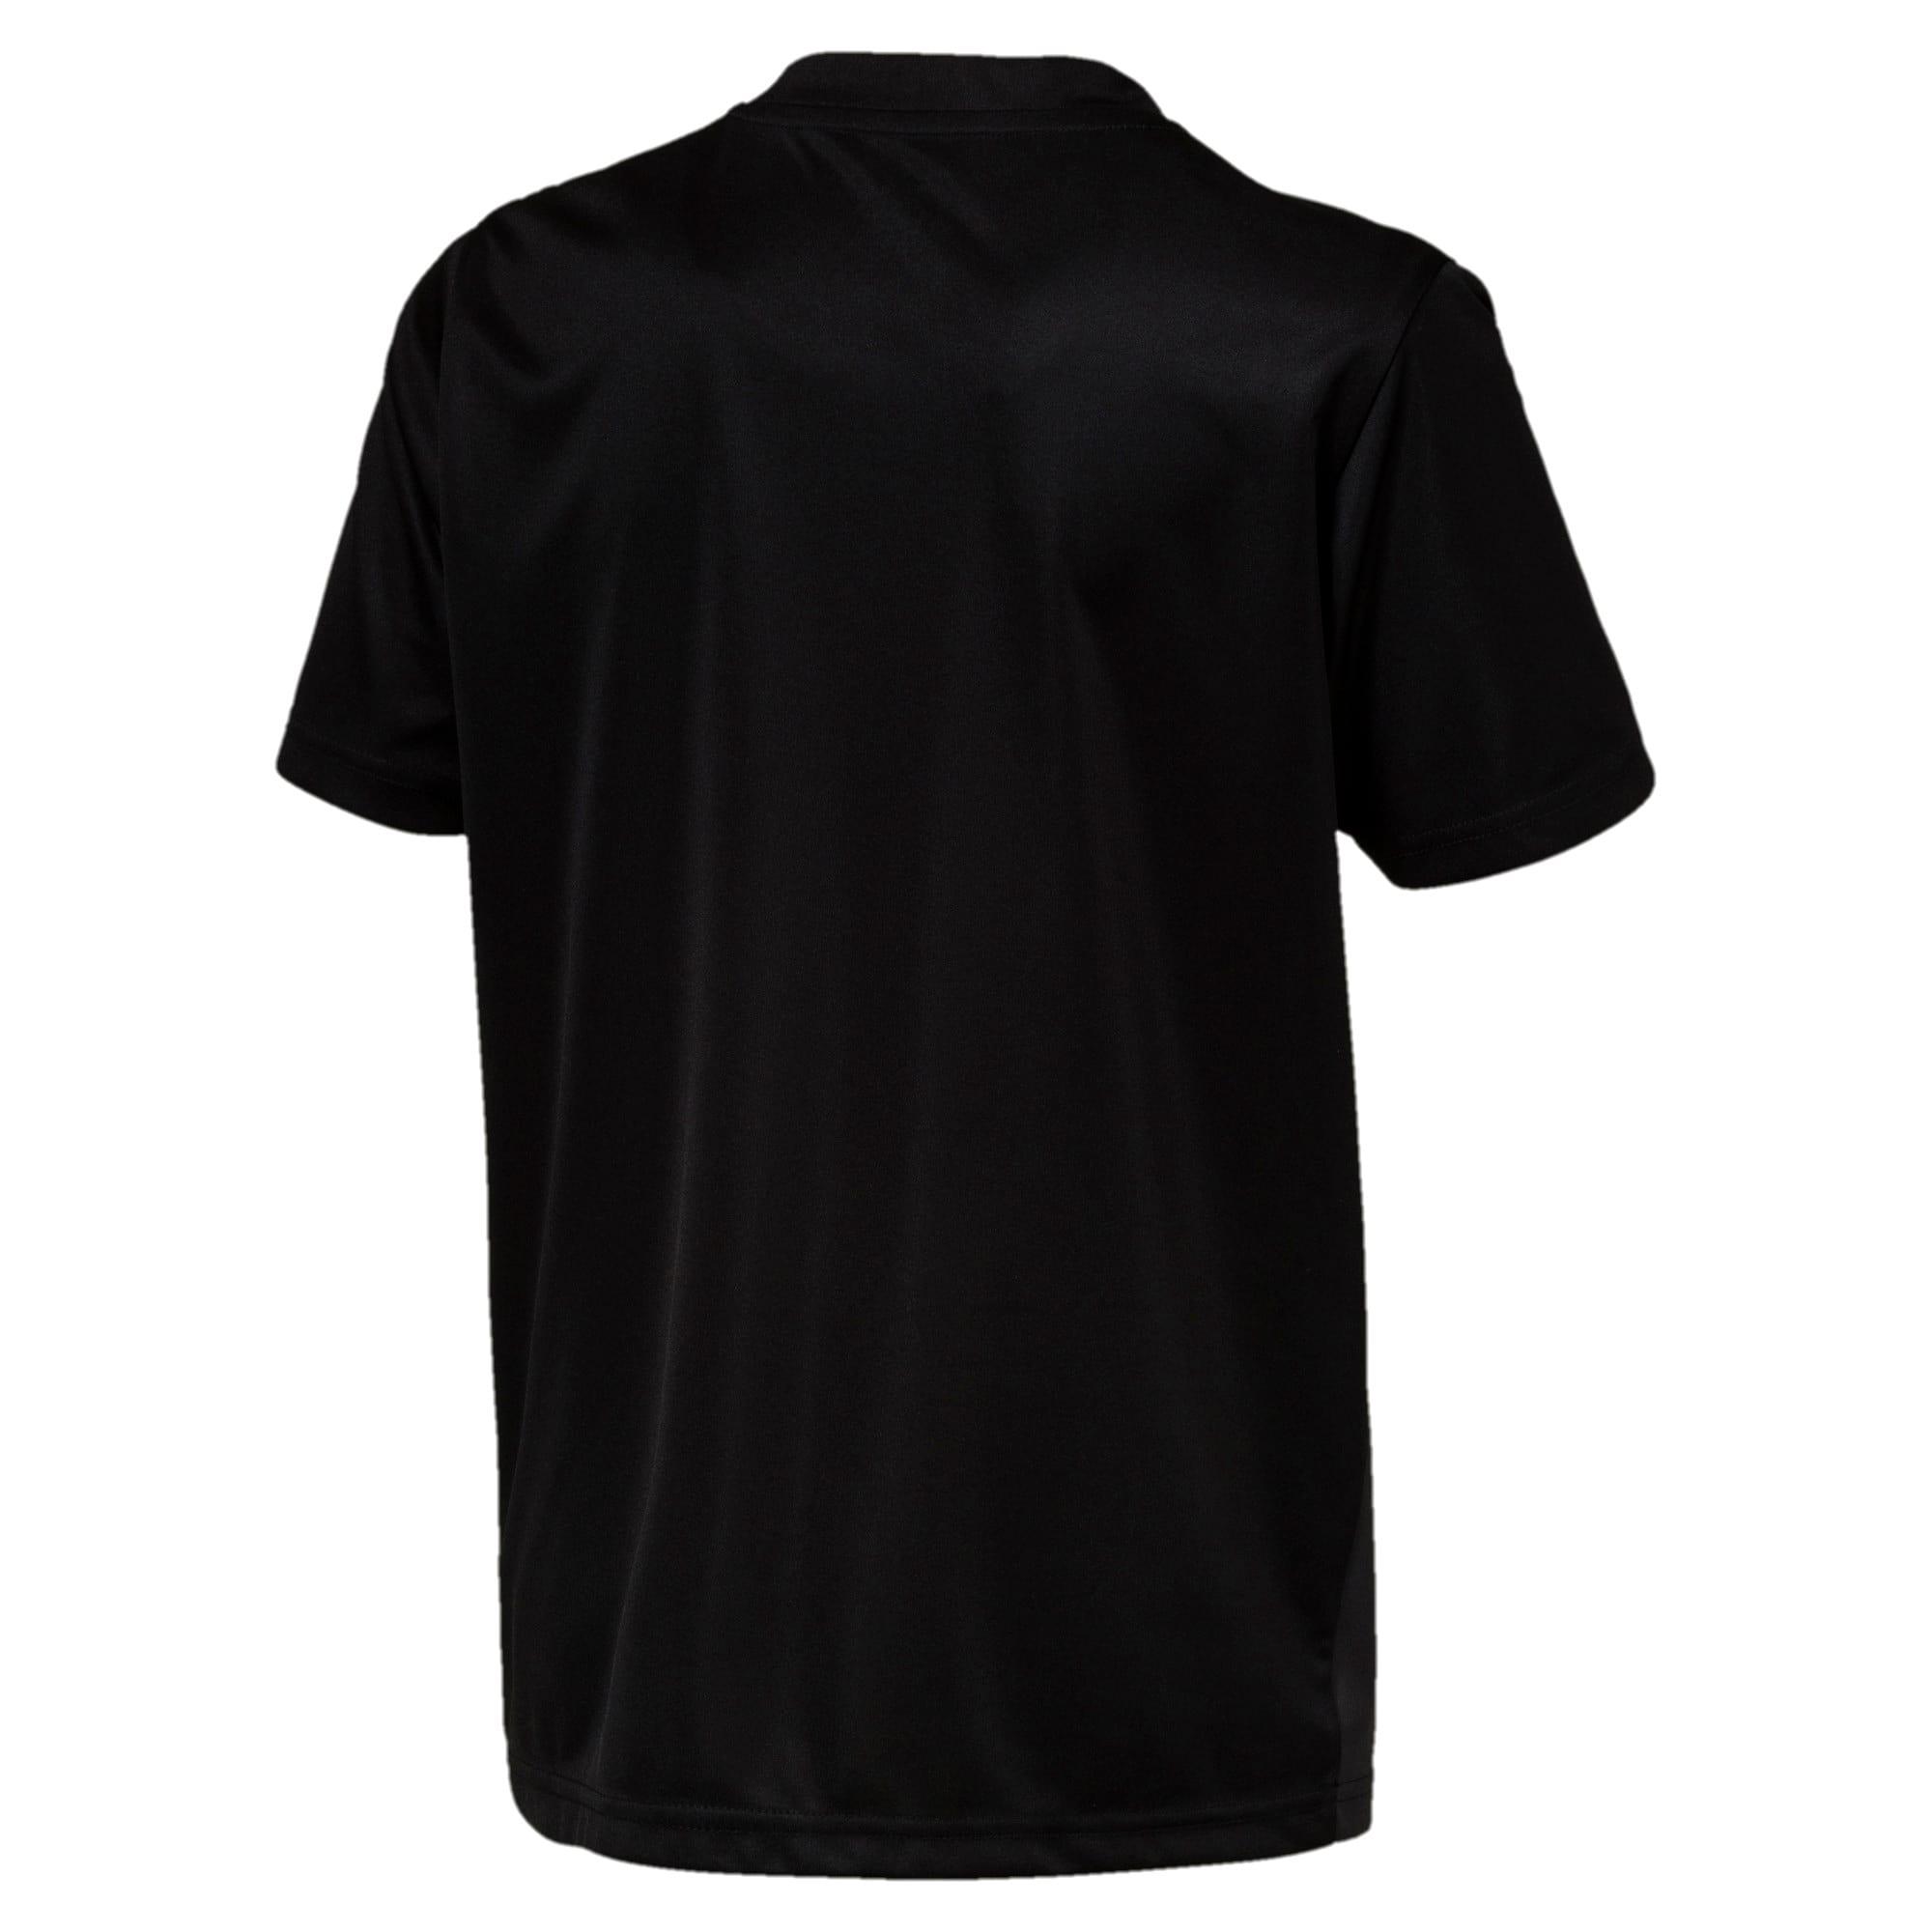 Thumbnail 2 of ftblPLAY Graphic Boys' Shirt, Asphalt-Puma Black, medium